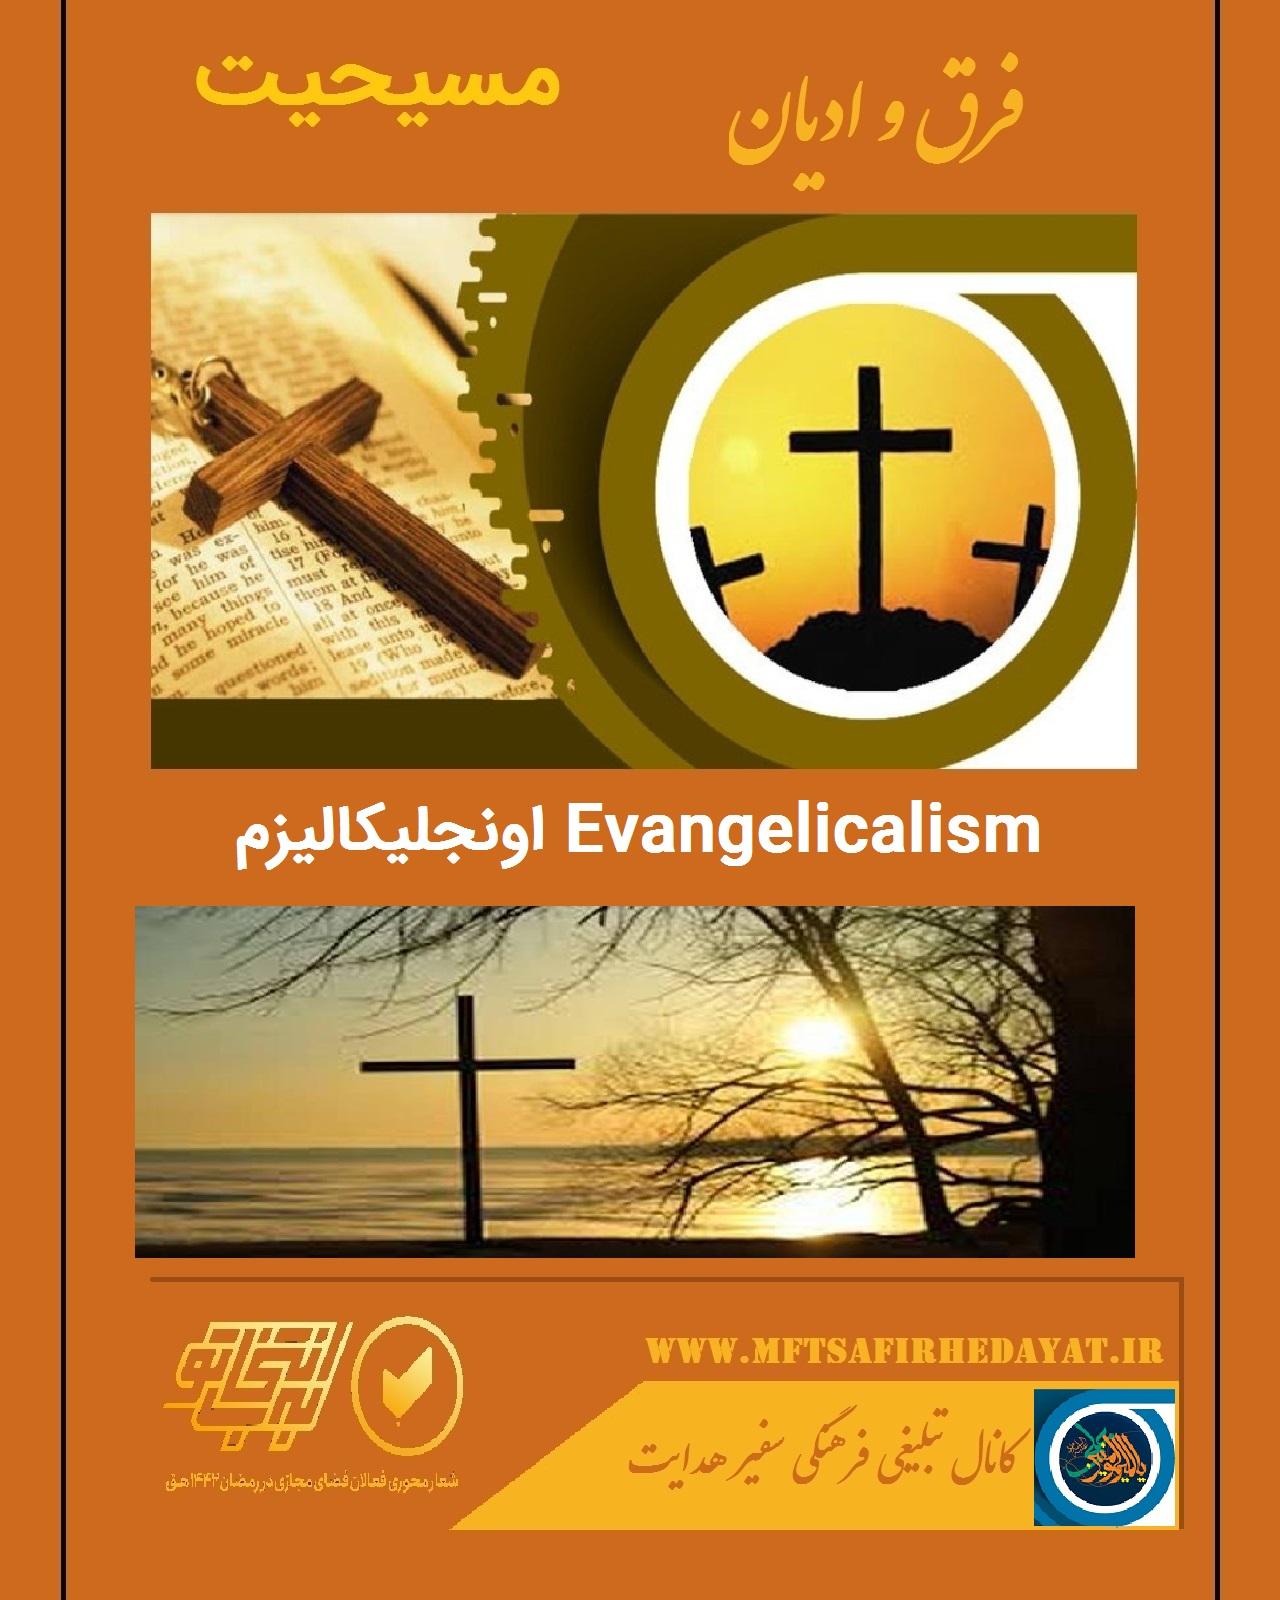 اونجلیکالیزم Evangelicalism